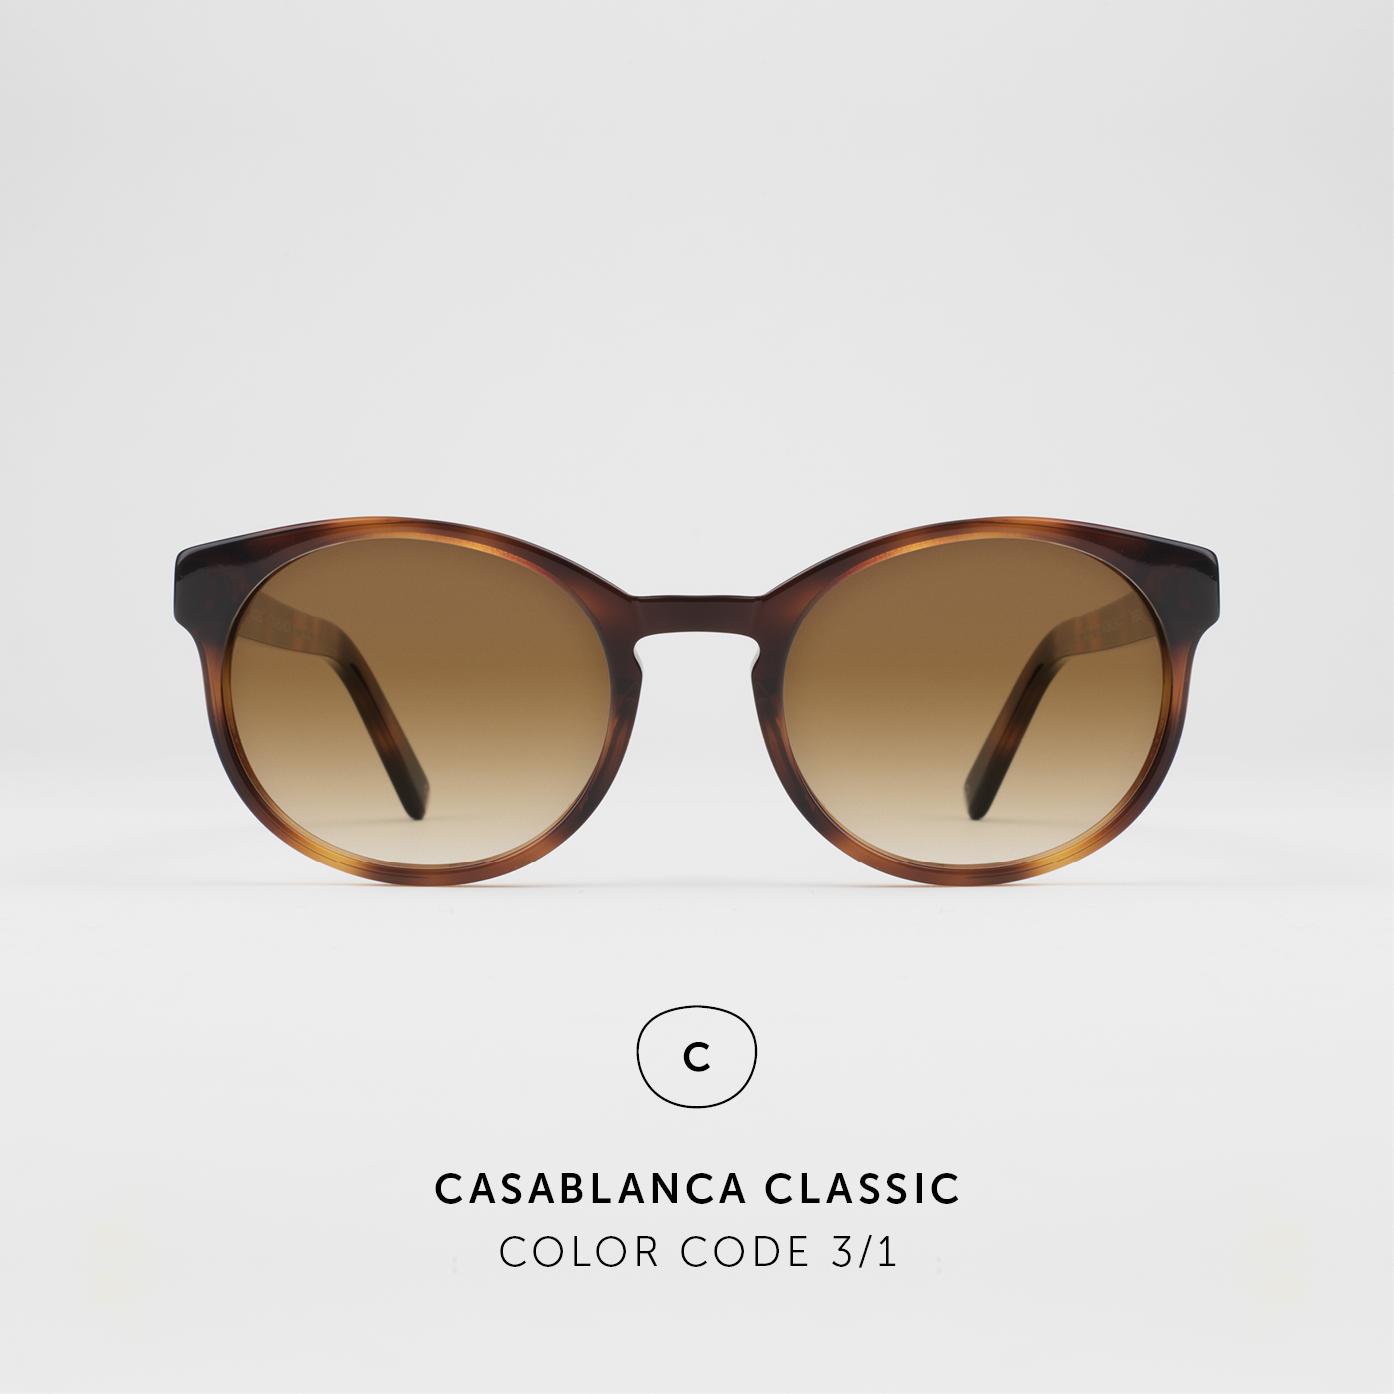 CasablancaClassic23.jpg